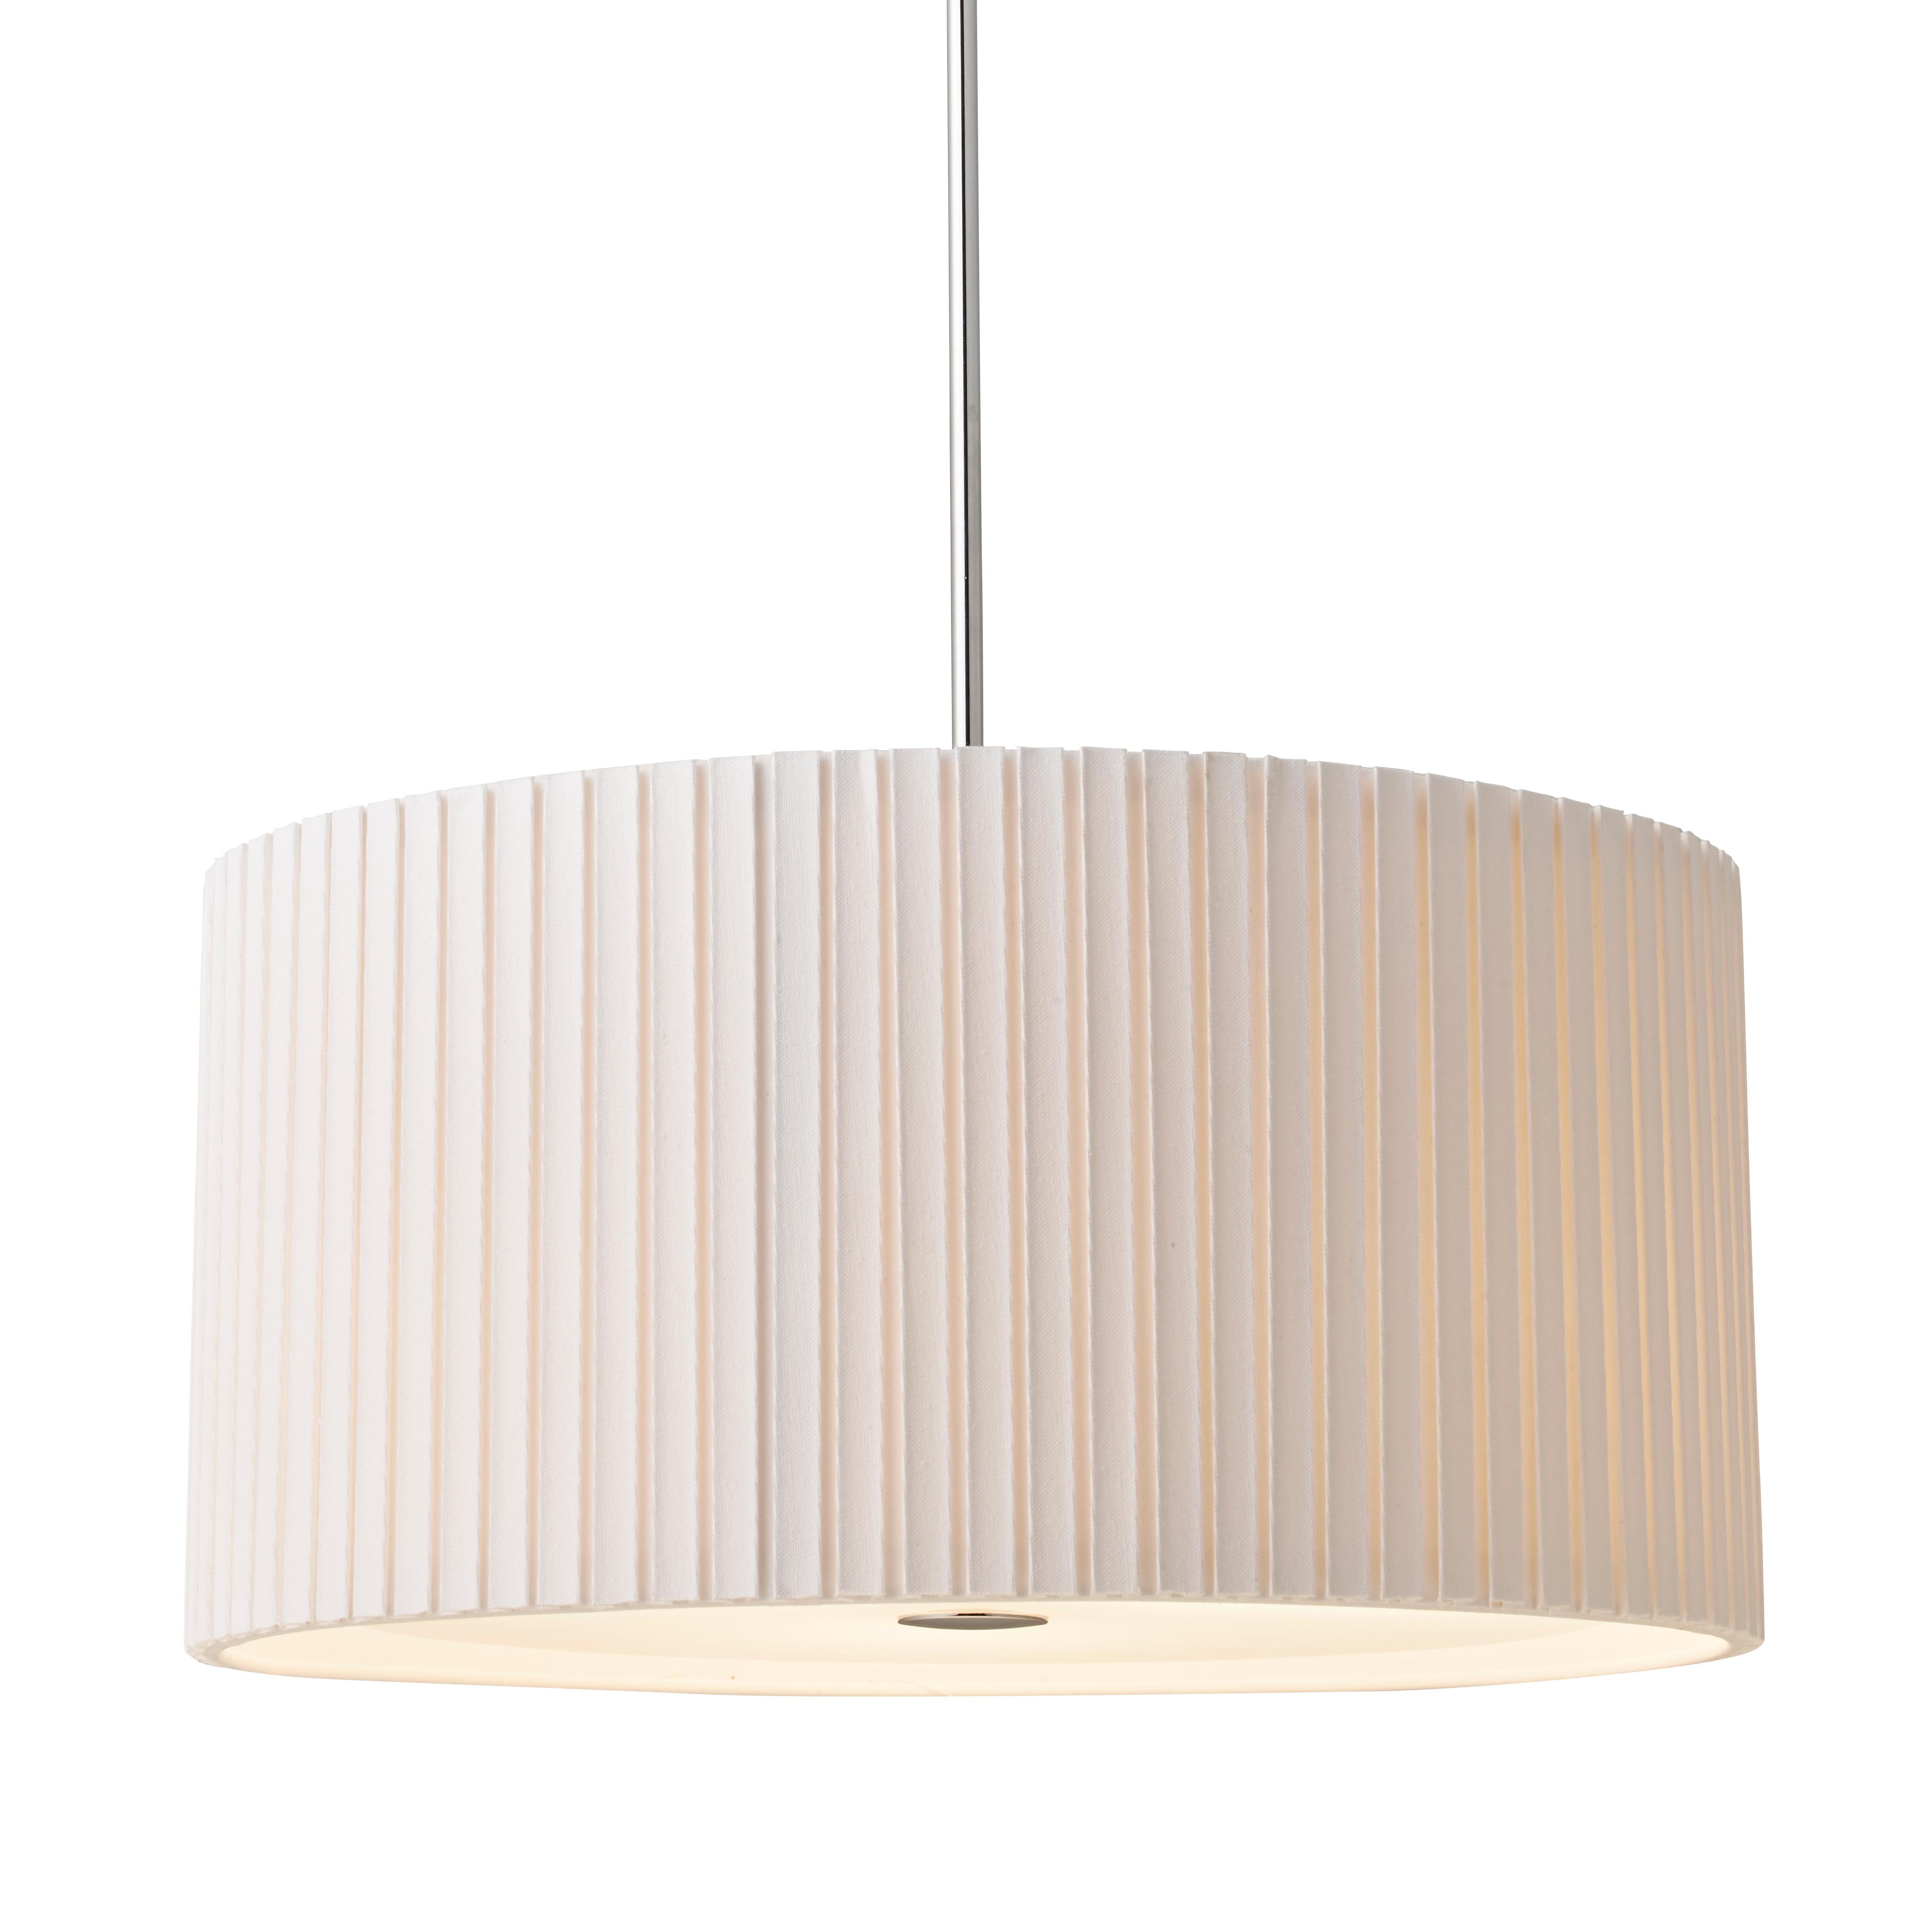 Image of   Herstal pendel - Cole - Pleat White